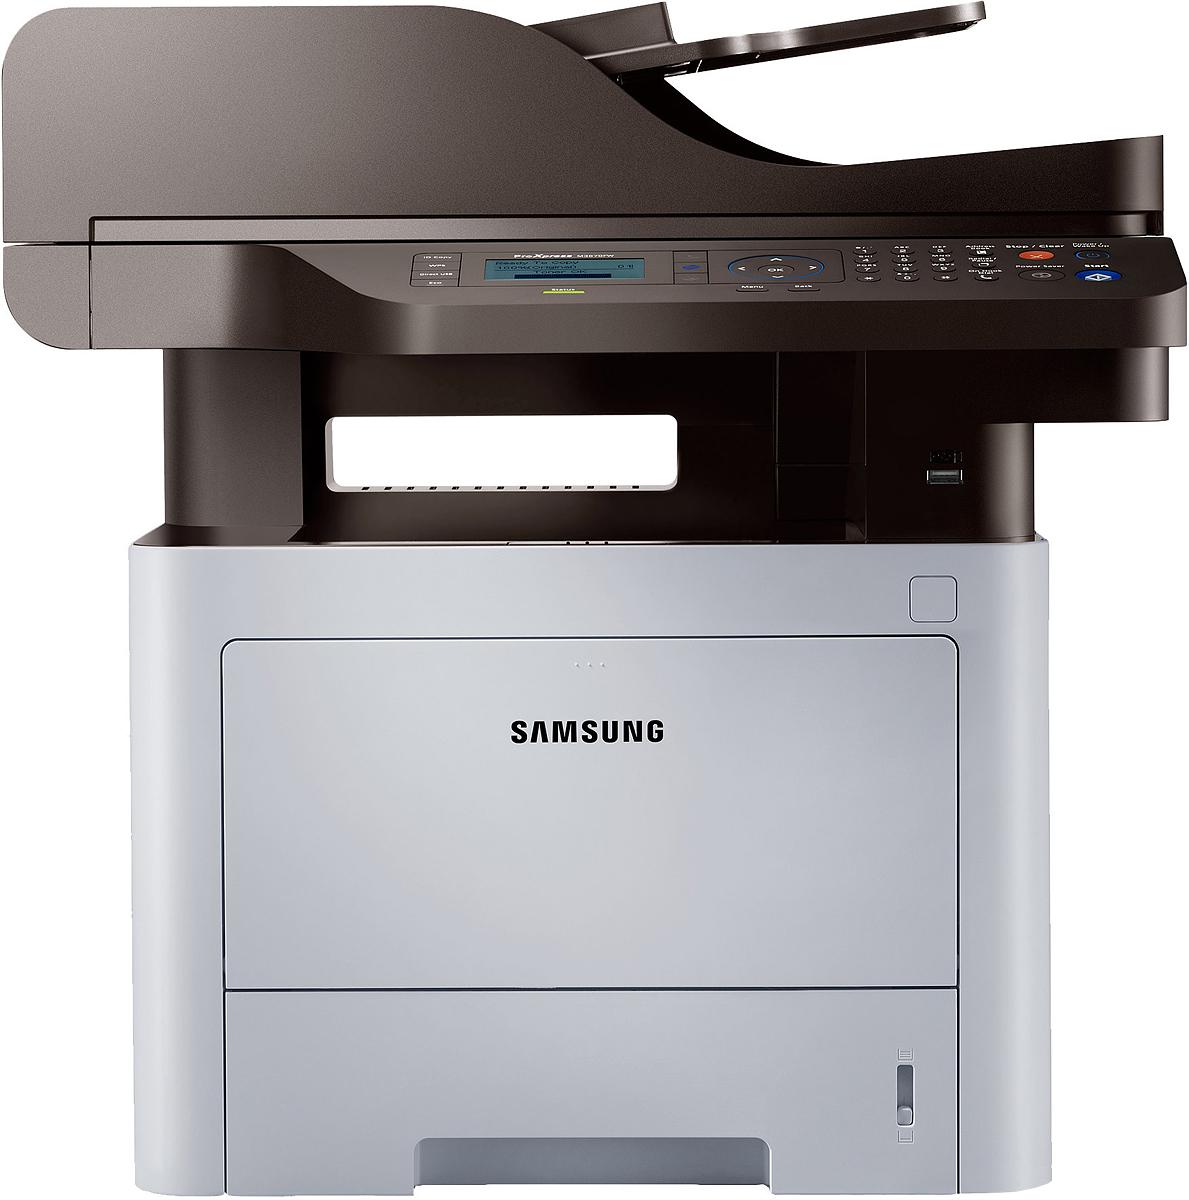 цена на Samsung ProXpress SL-M3870FW МФУ